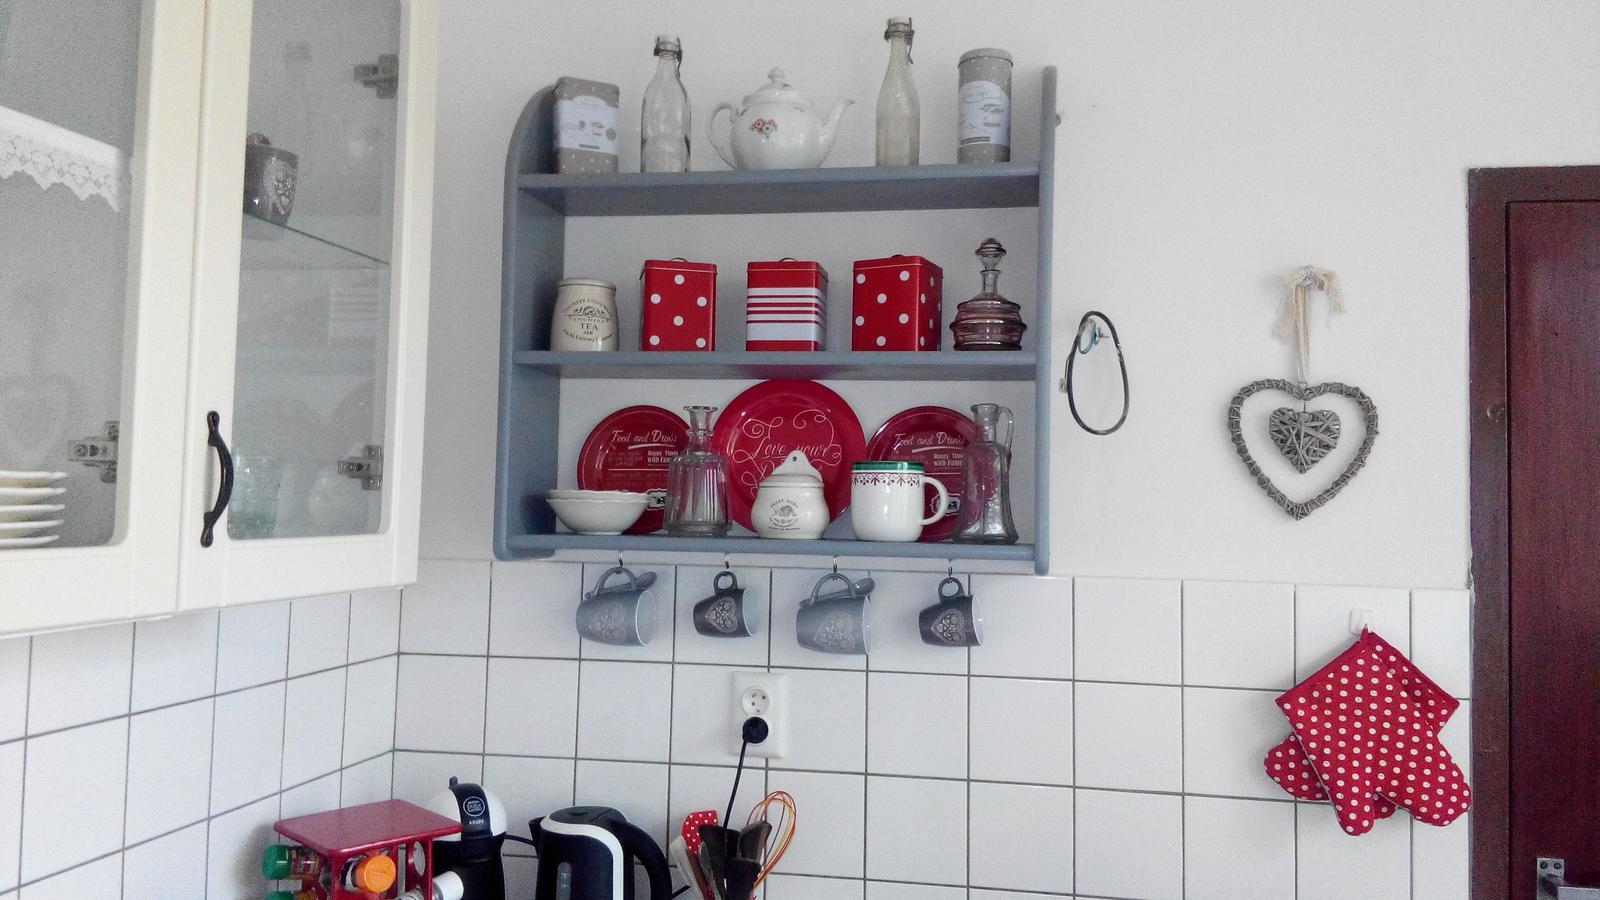 Kuchyňa - Este to chce daku lampu kedze tam nebude zatial digestor